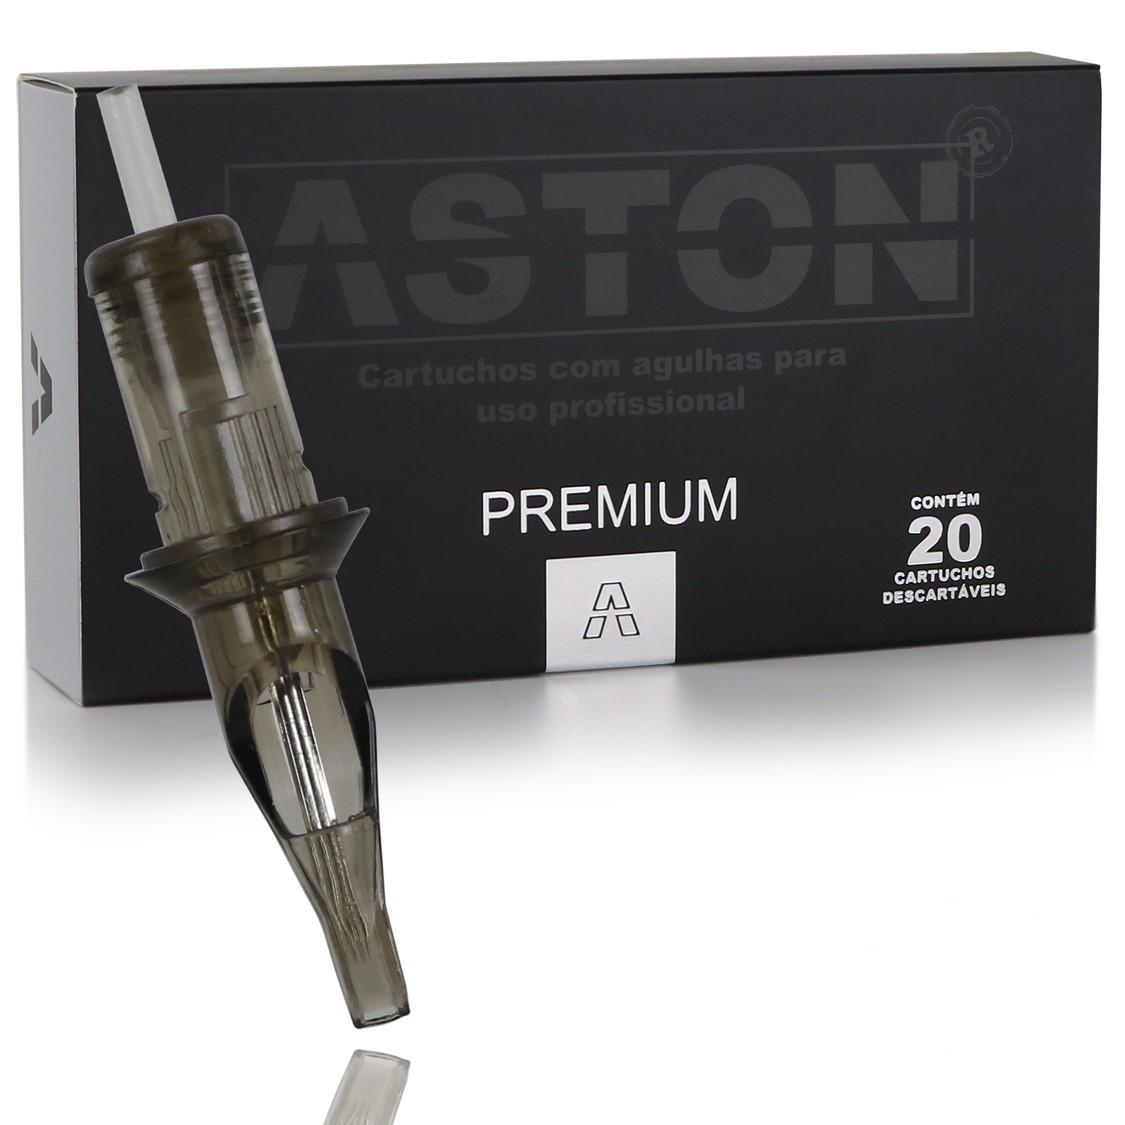 CAIXA CARTUCHO ASTON PREMIUM PINTURA MR (20 UN) - 1025MR